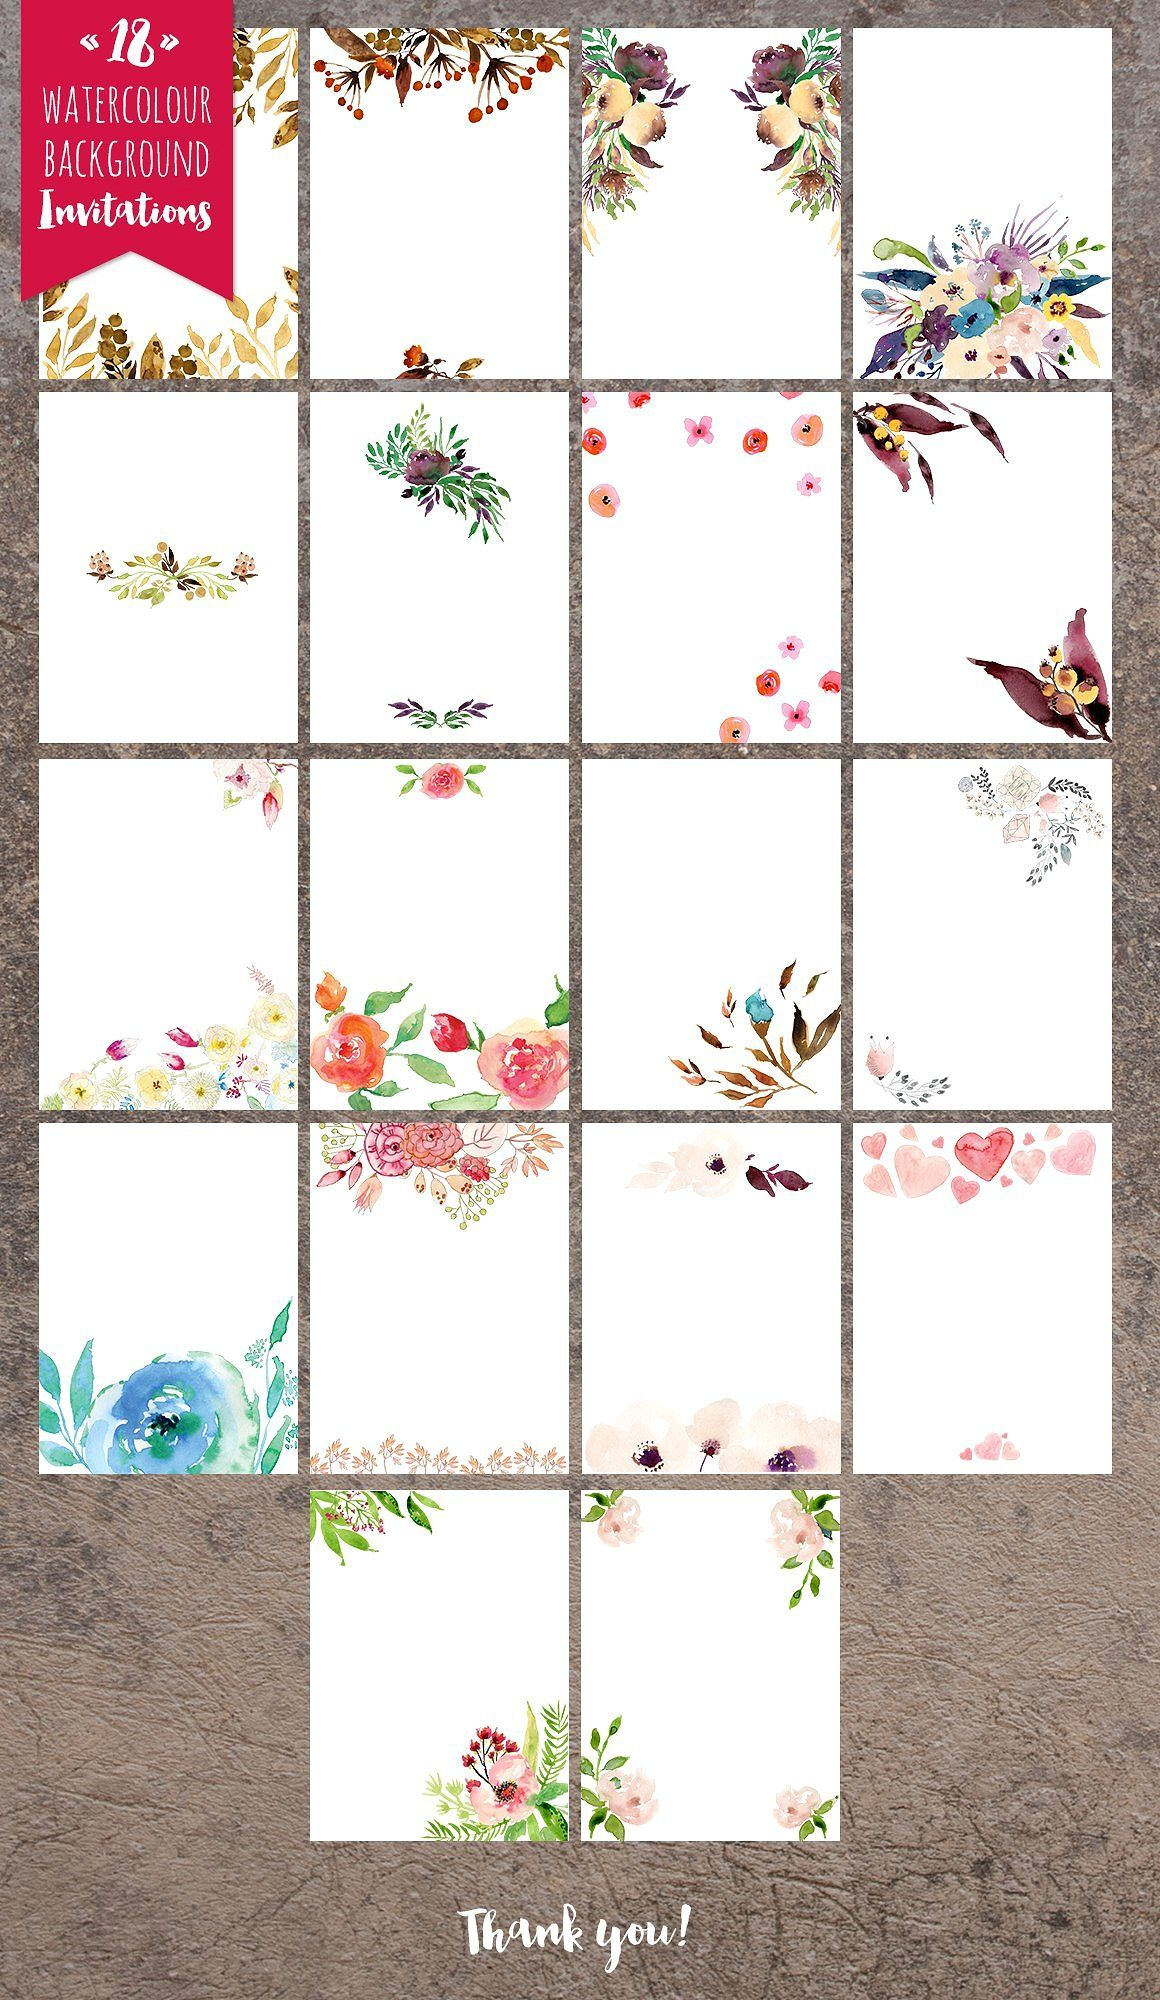 18 Invitation backgrounds by Webvilla on @creativemarket ...